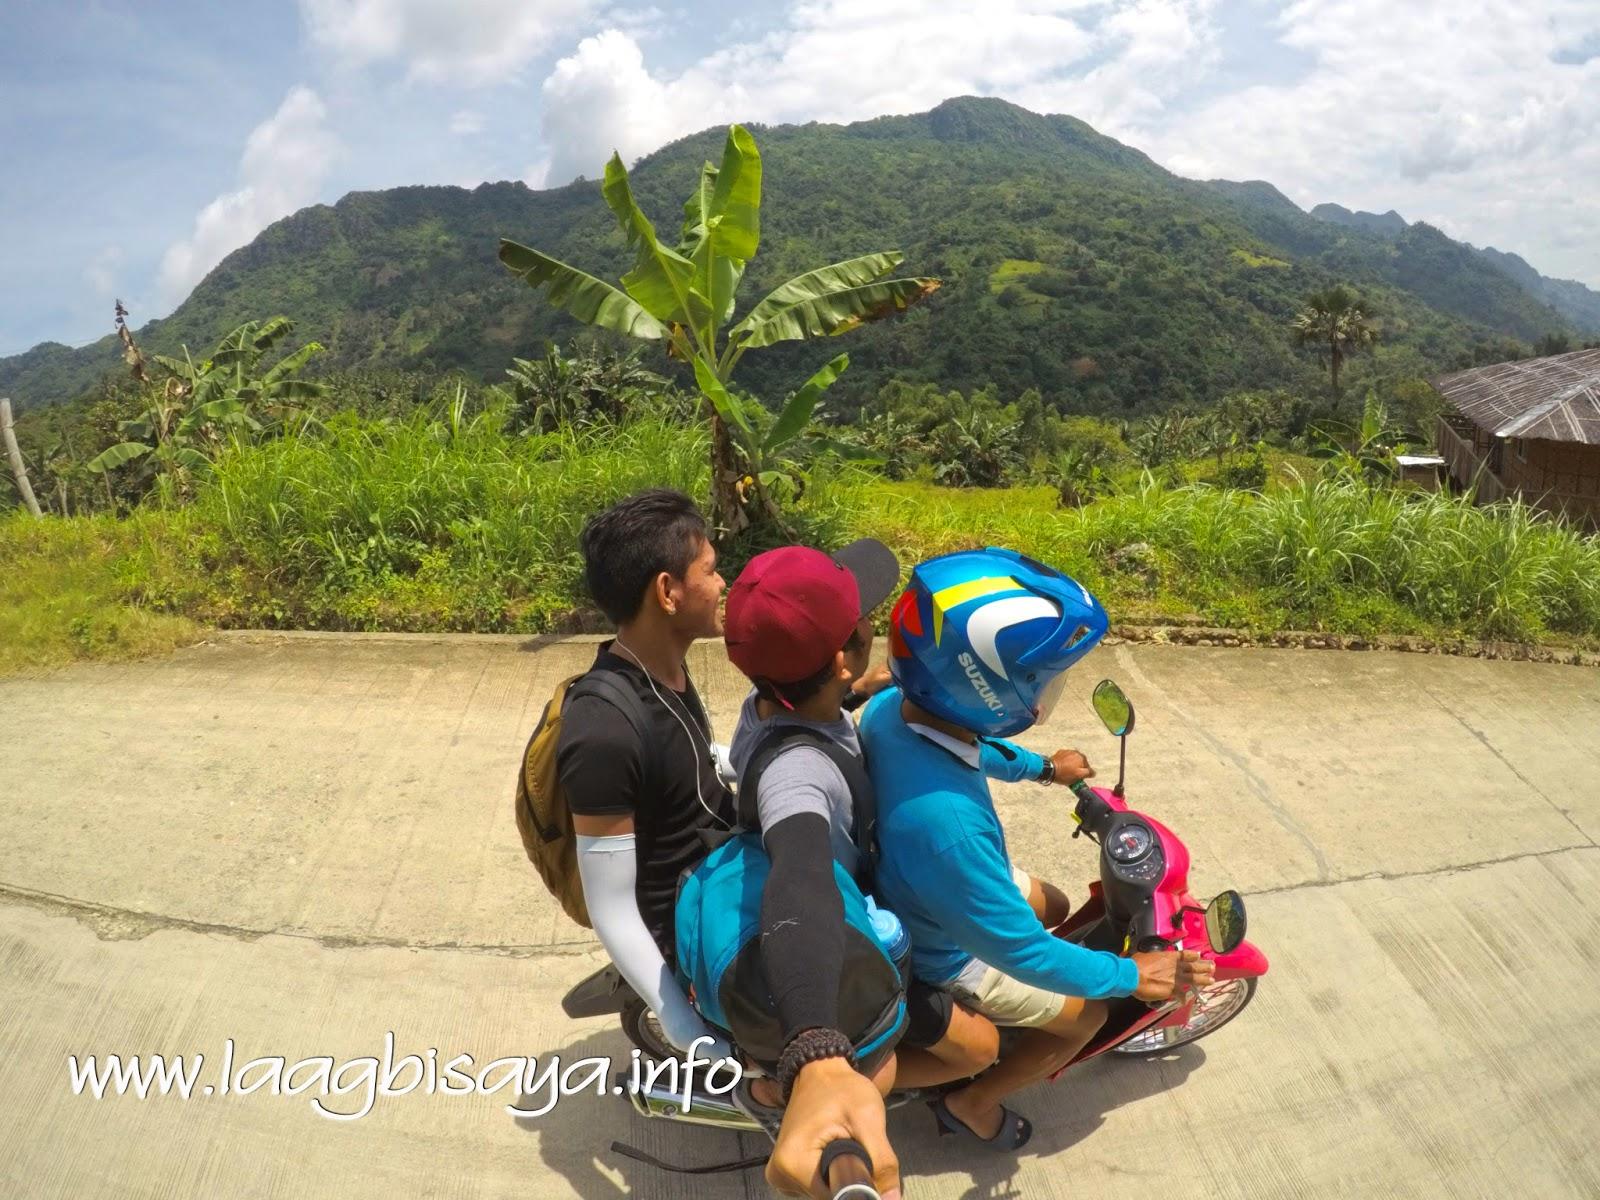 Mt. Mauyog Balamban